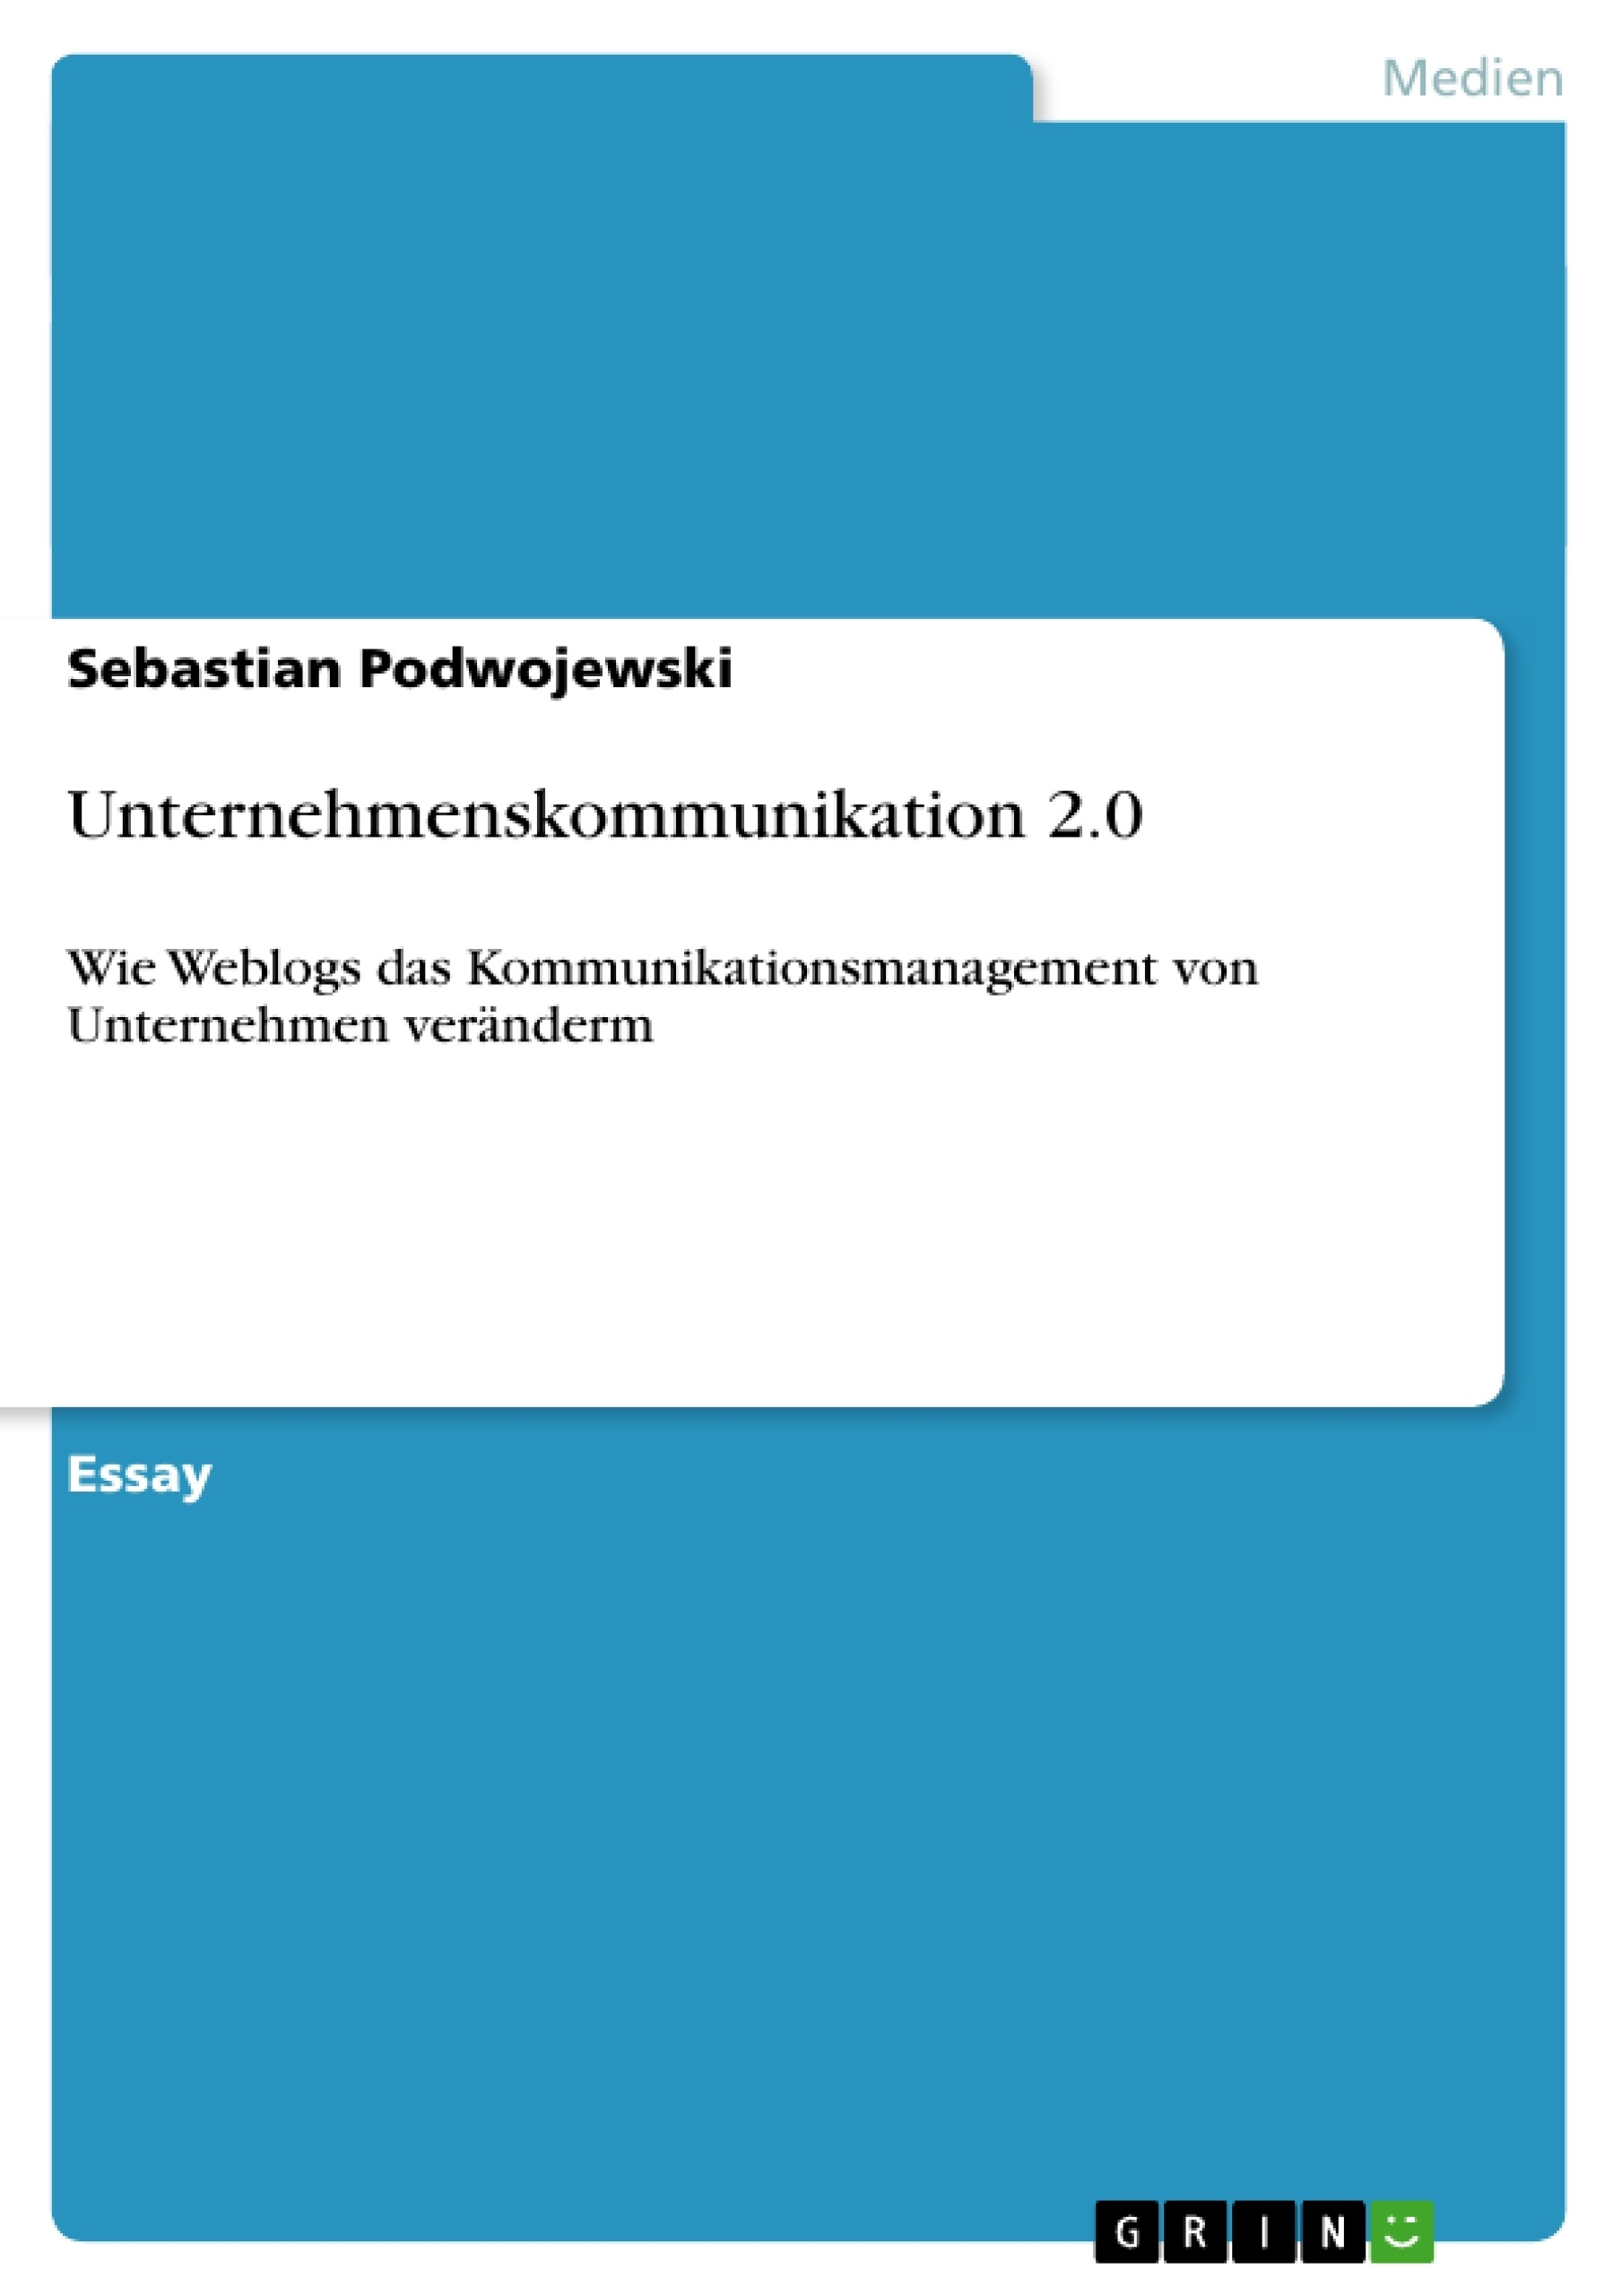 Titel: Unternehmenskommunikation 2.0